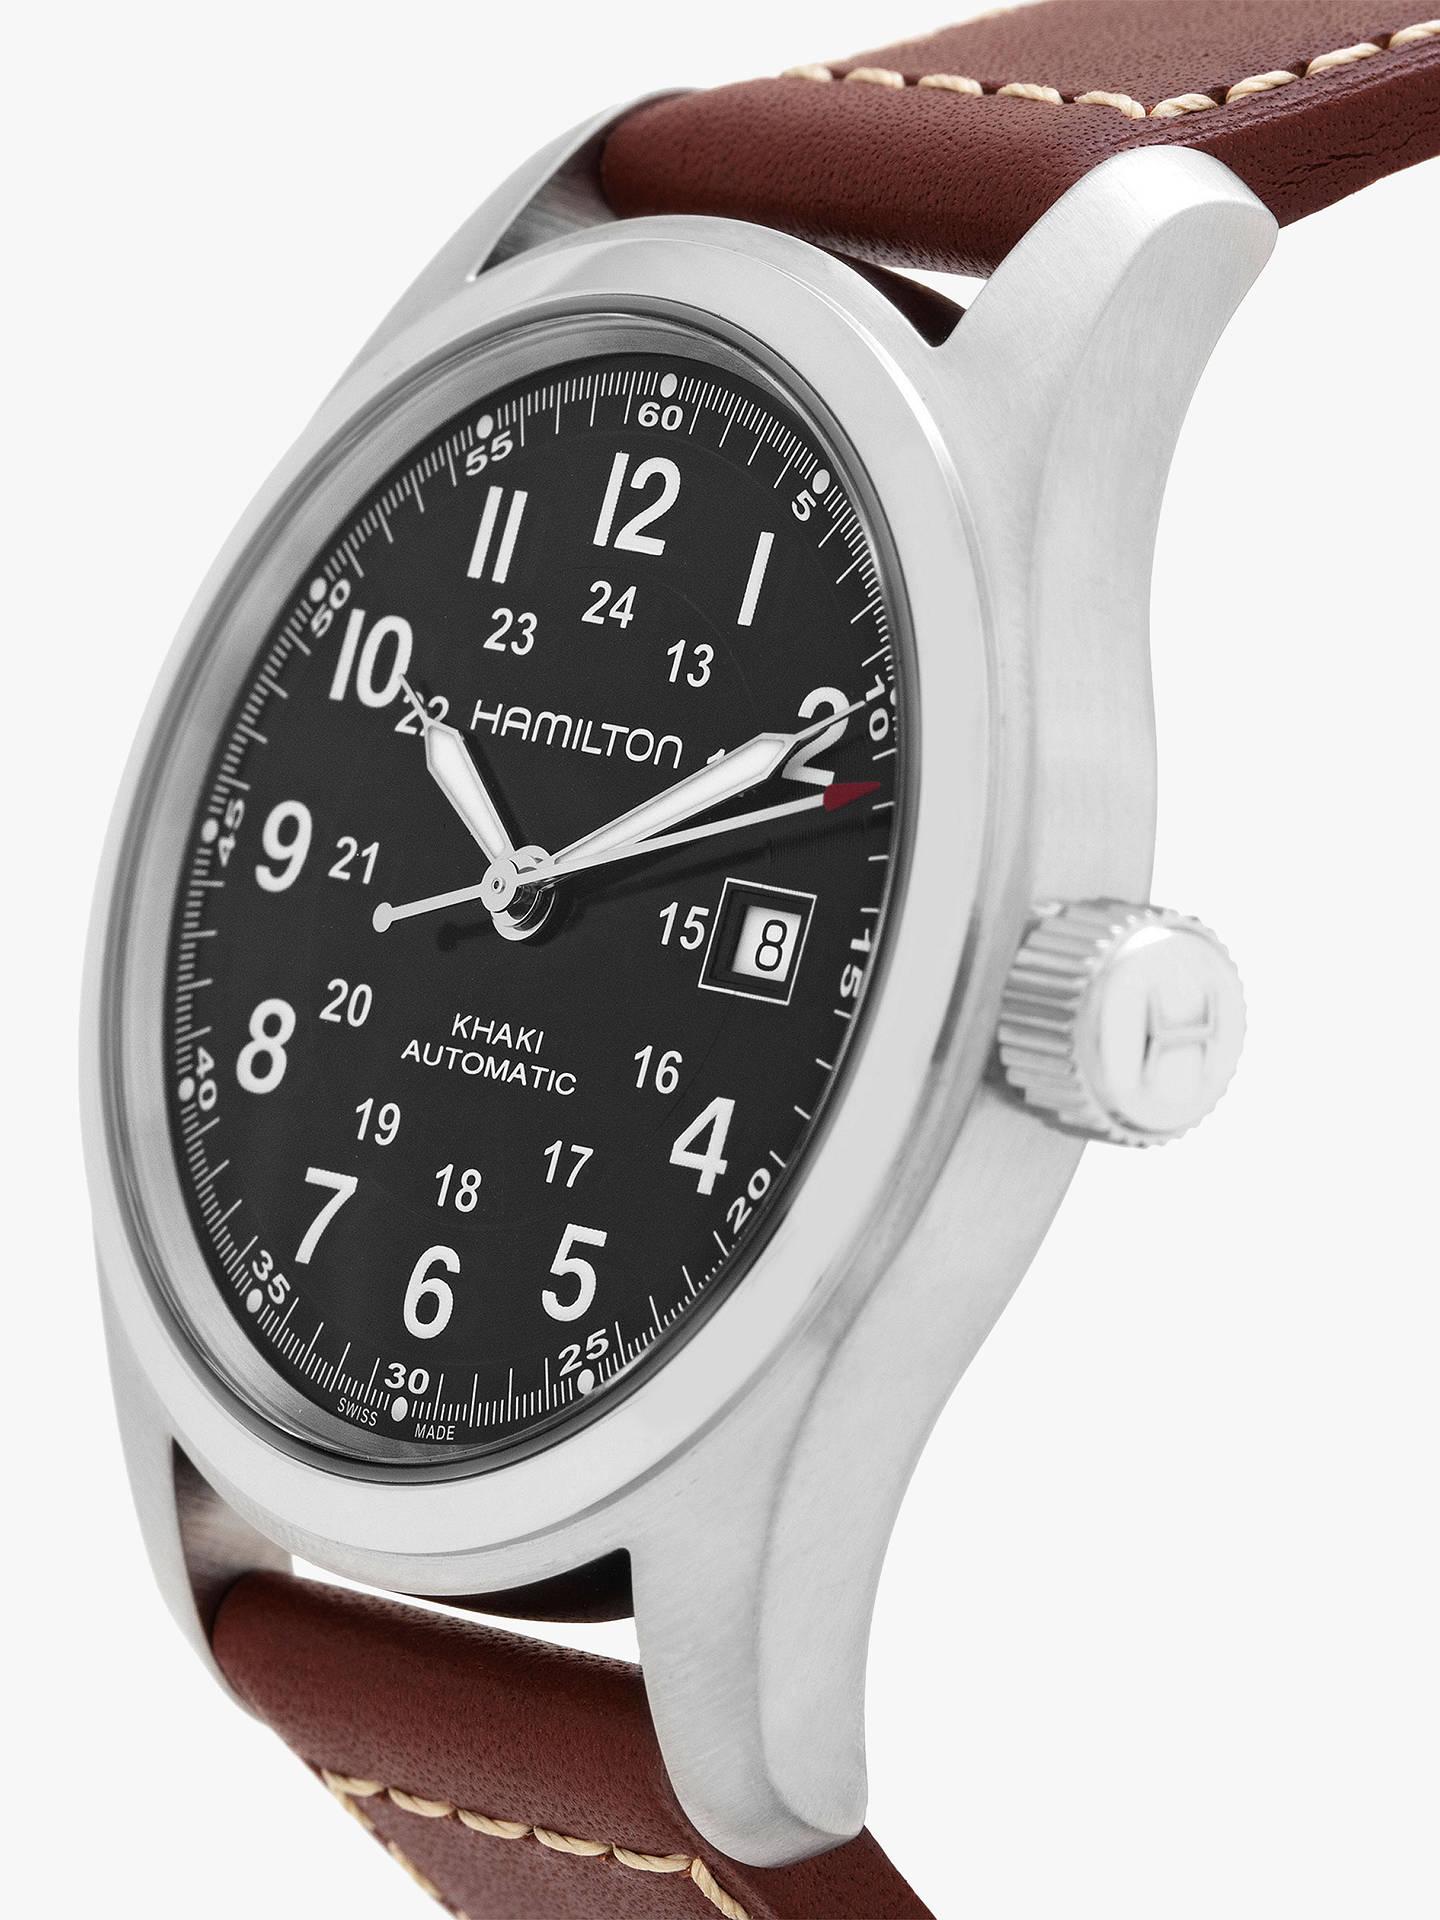 15fdfe3aa ... Buy Hamilton H70555533 Men's Khaki Field Automatic Date Leather Strap  Watch, Dark Brown/Black ...